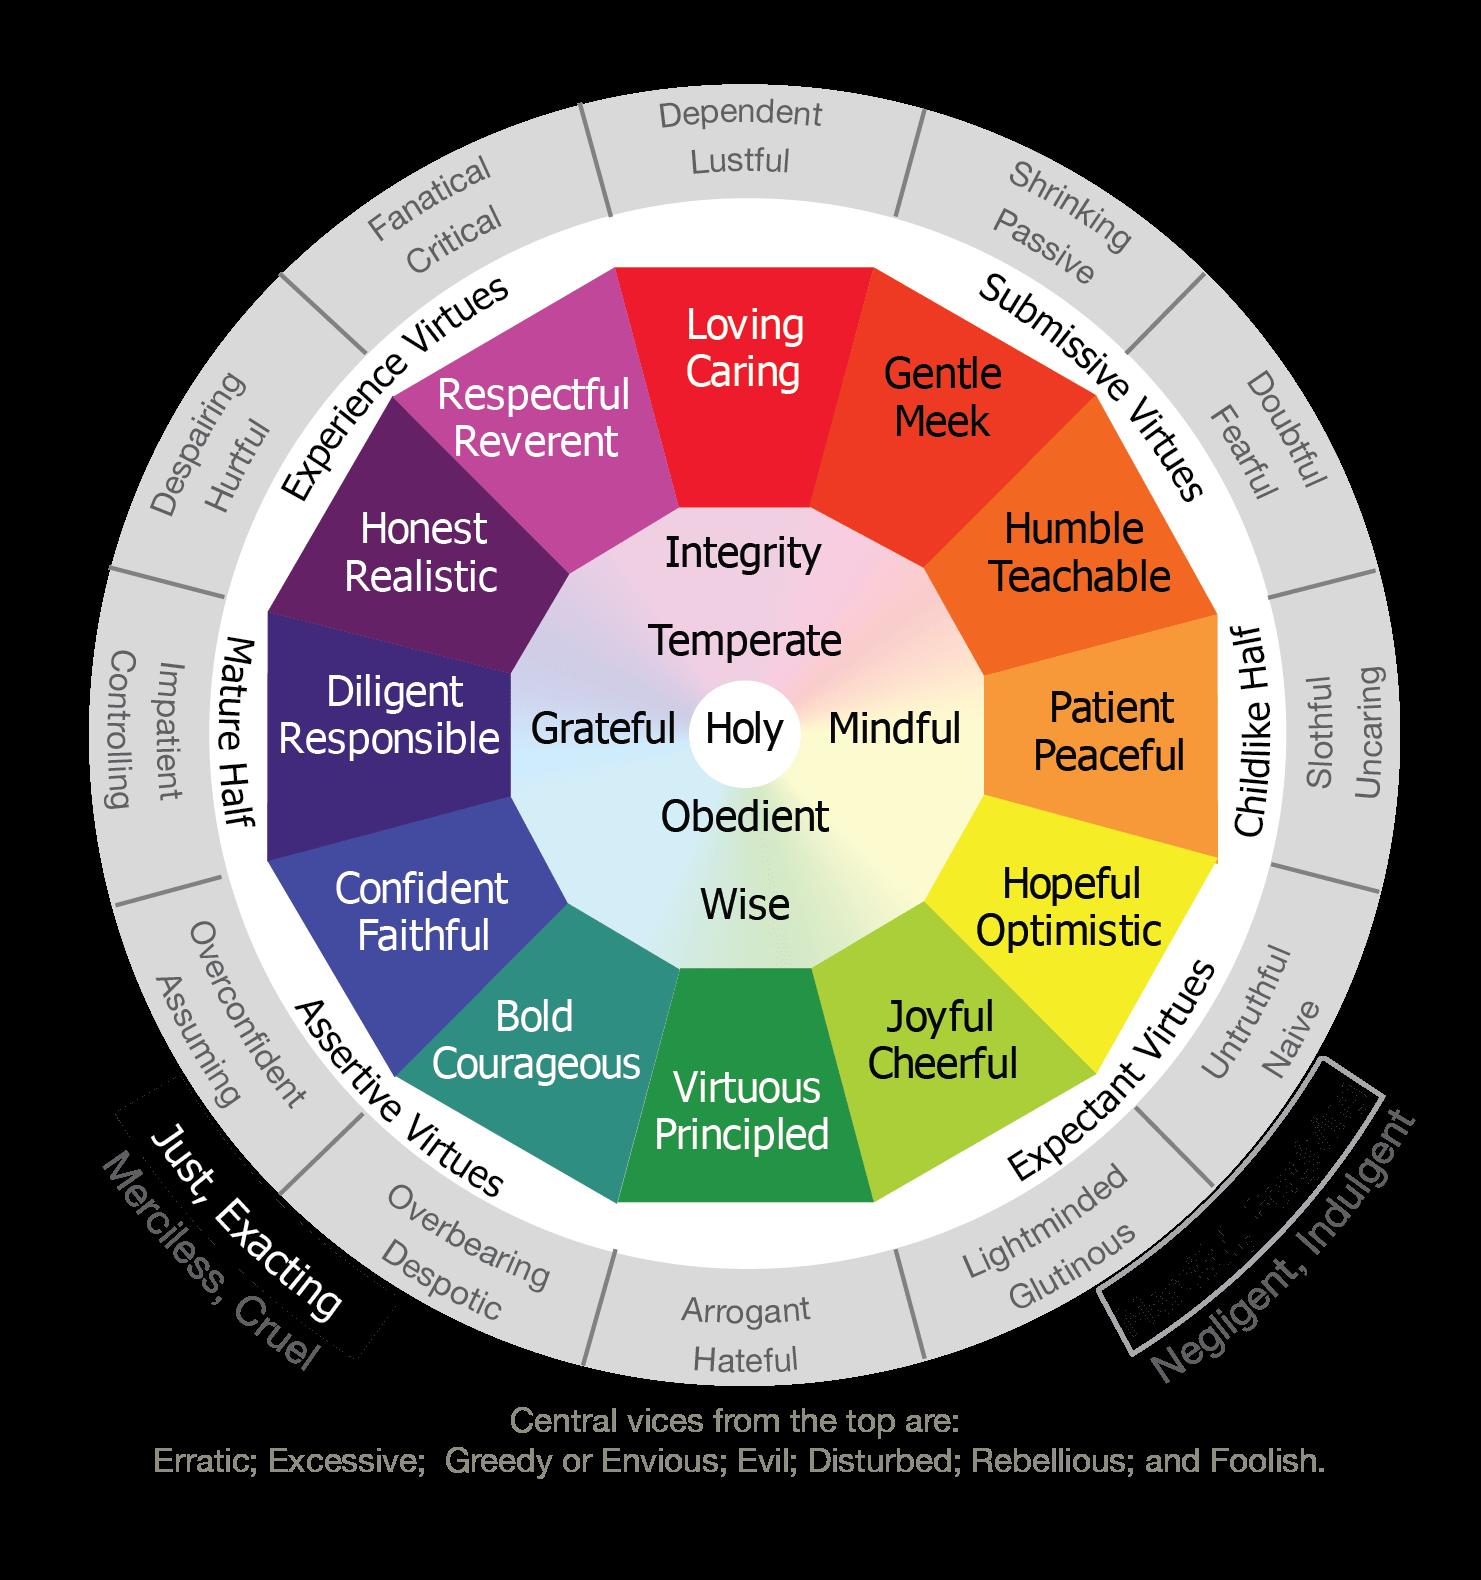 The Virtue Wheel graphic